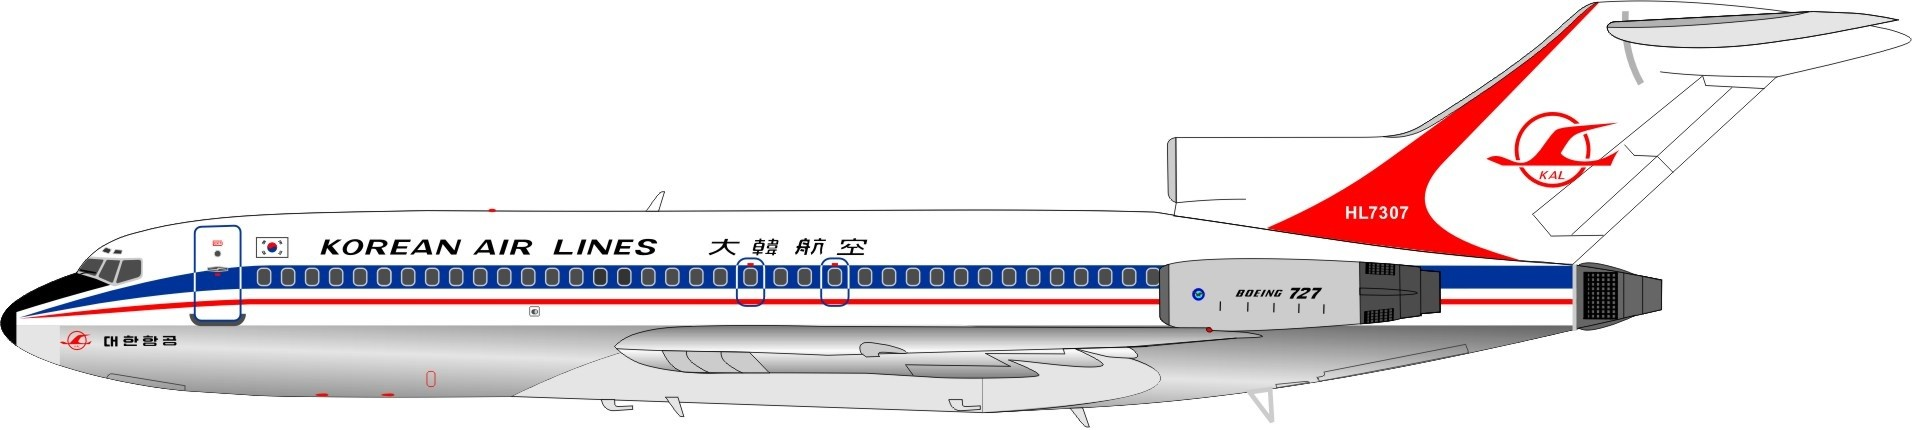 BlueBox B722TS01  Boeing 727-225 Trump N918TS in 1:200 scale